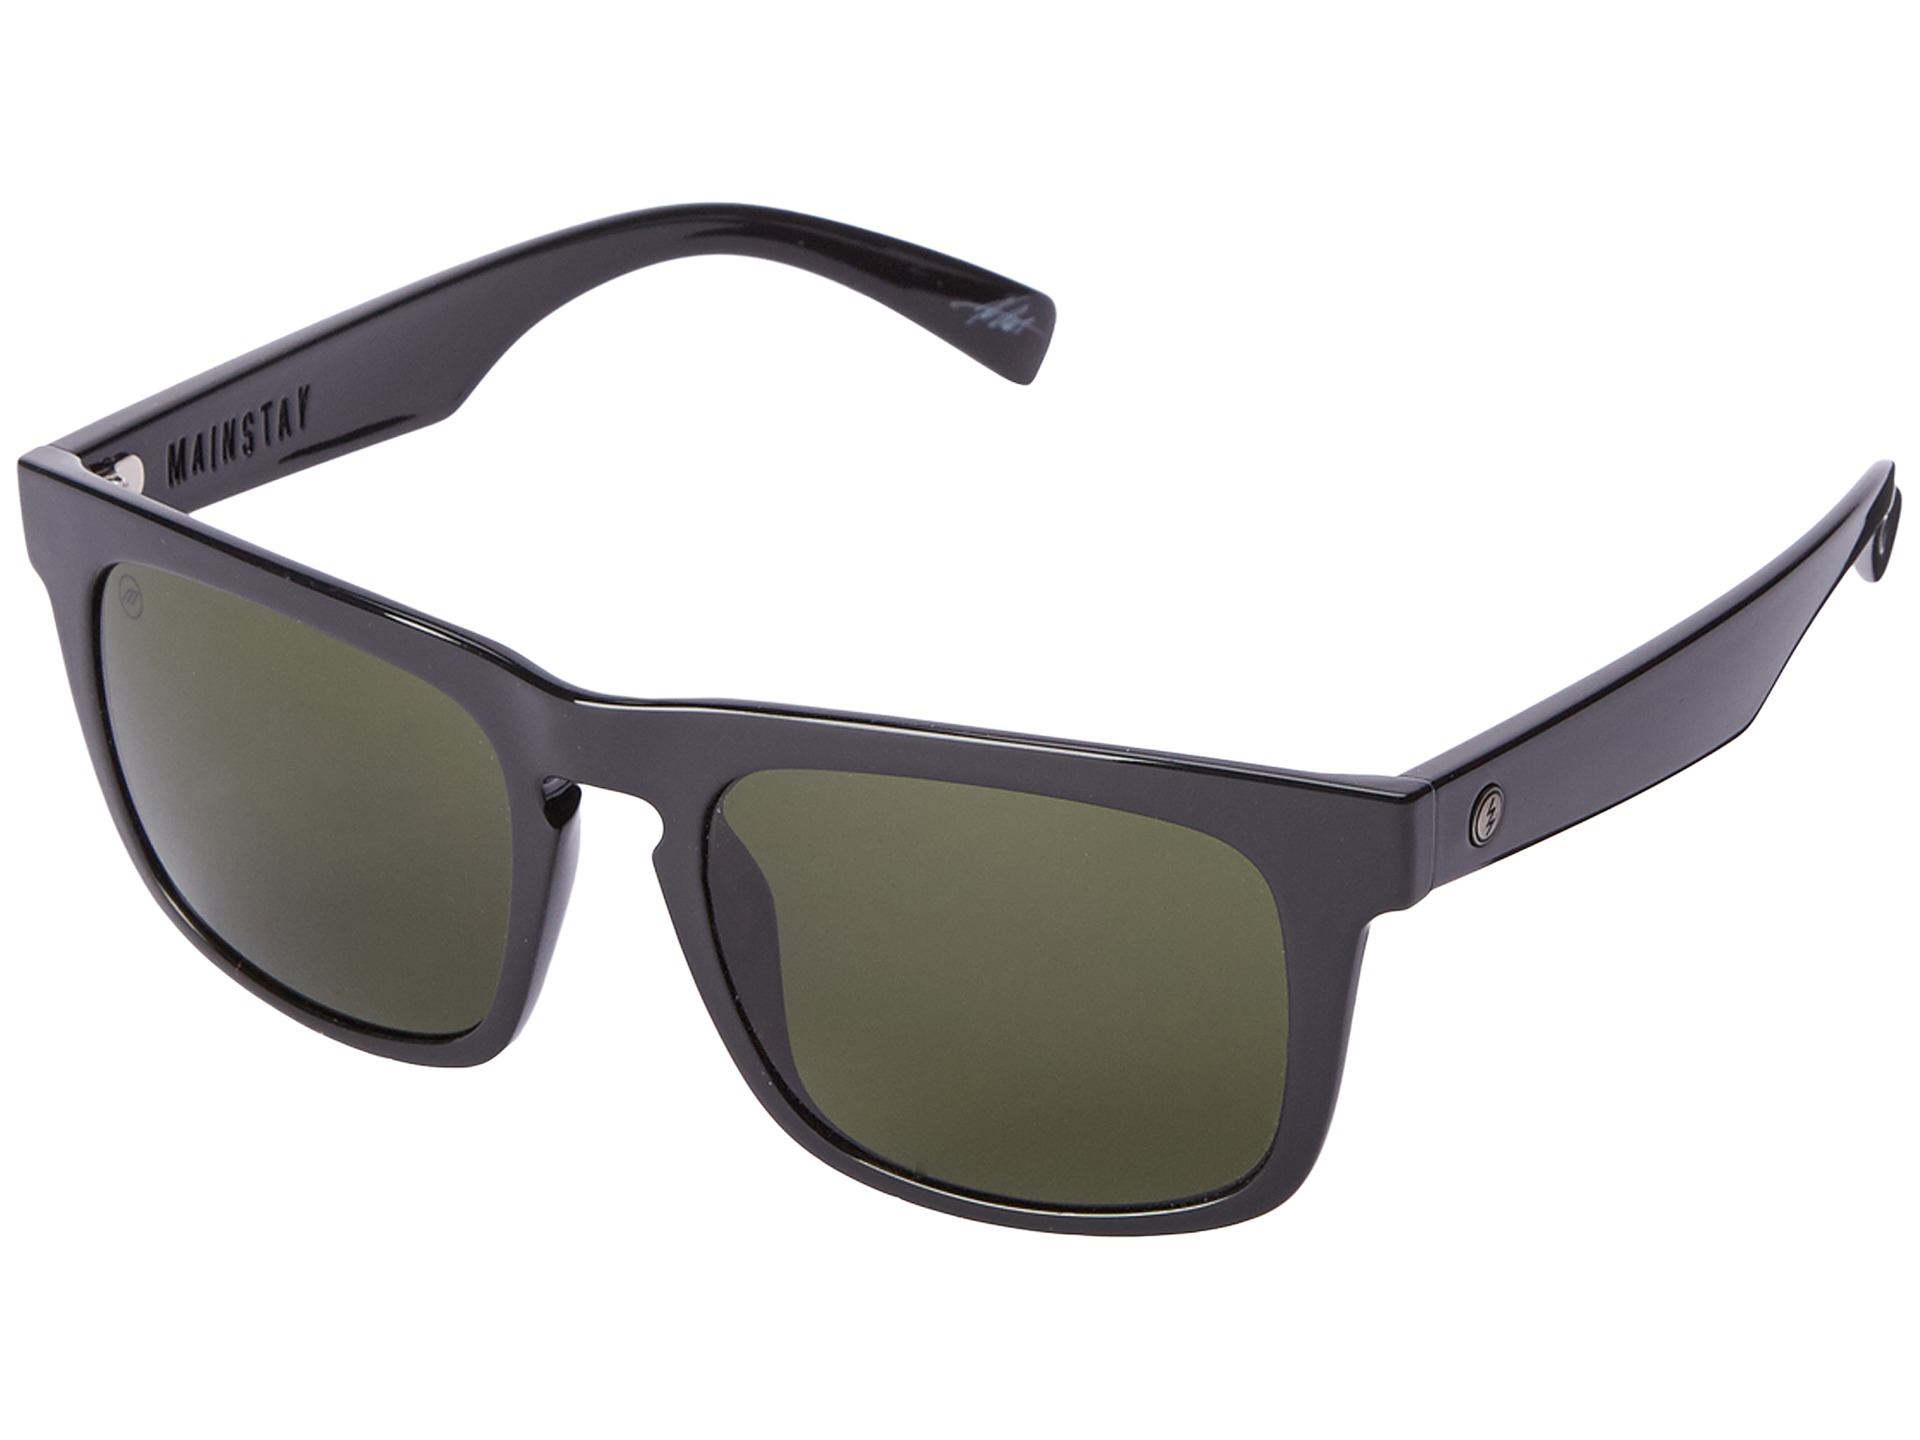 electric eyewear mainstay zappos free shipping both ways